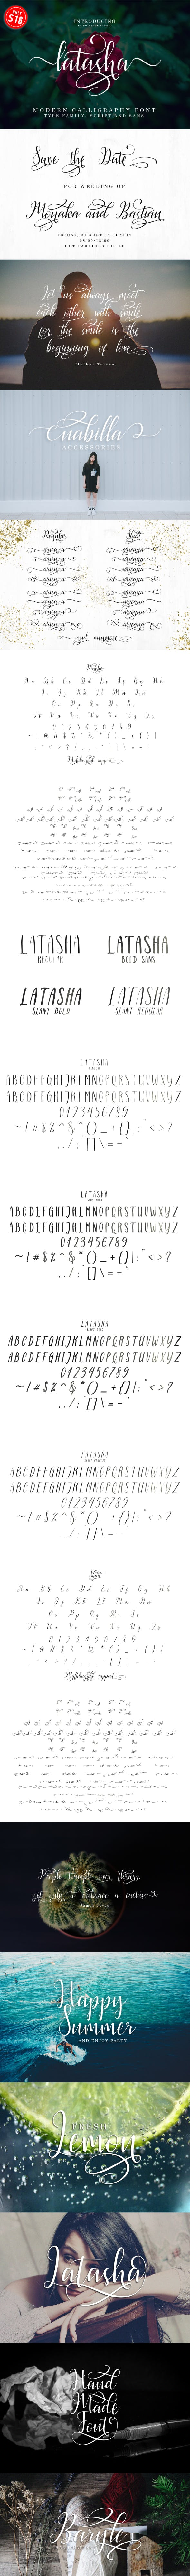 Latasha Font Family - 6 Font